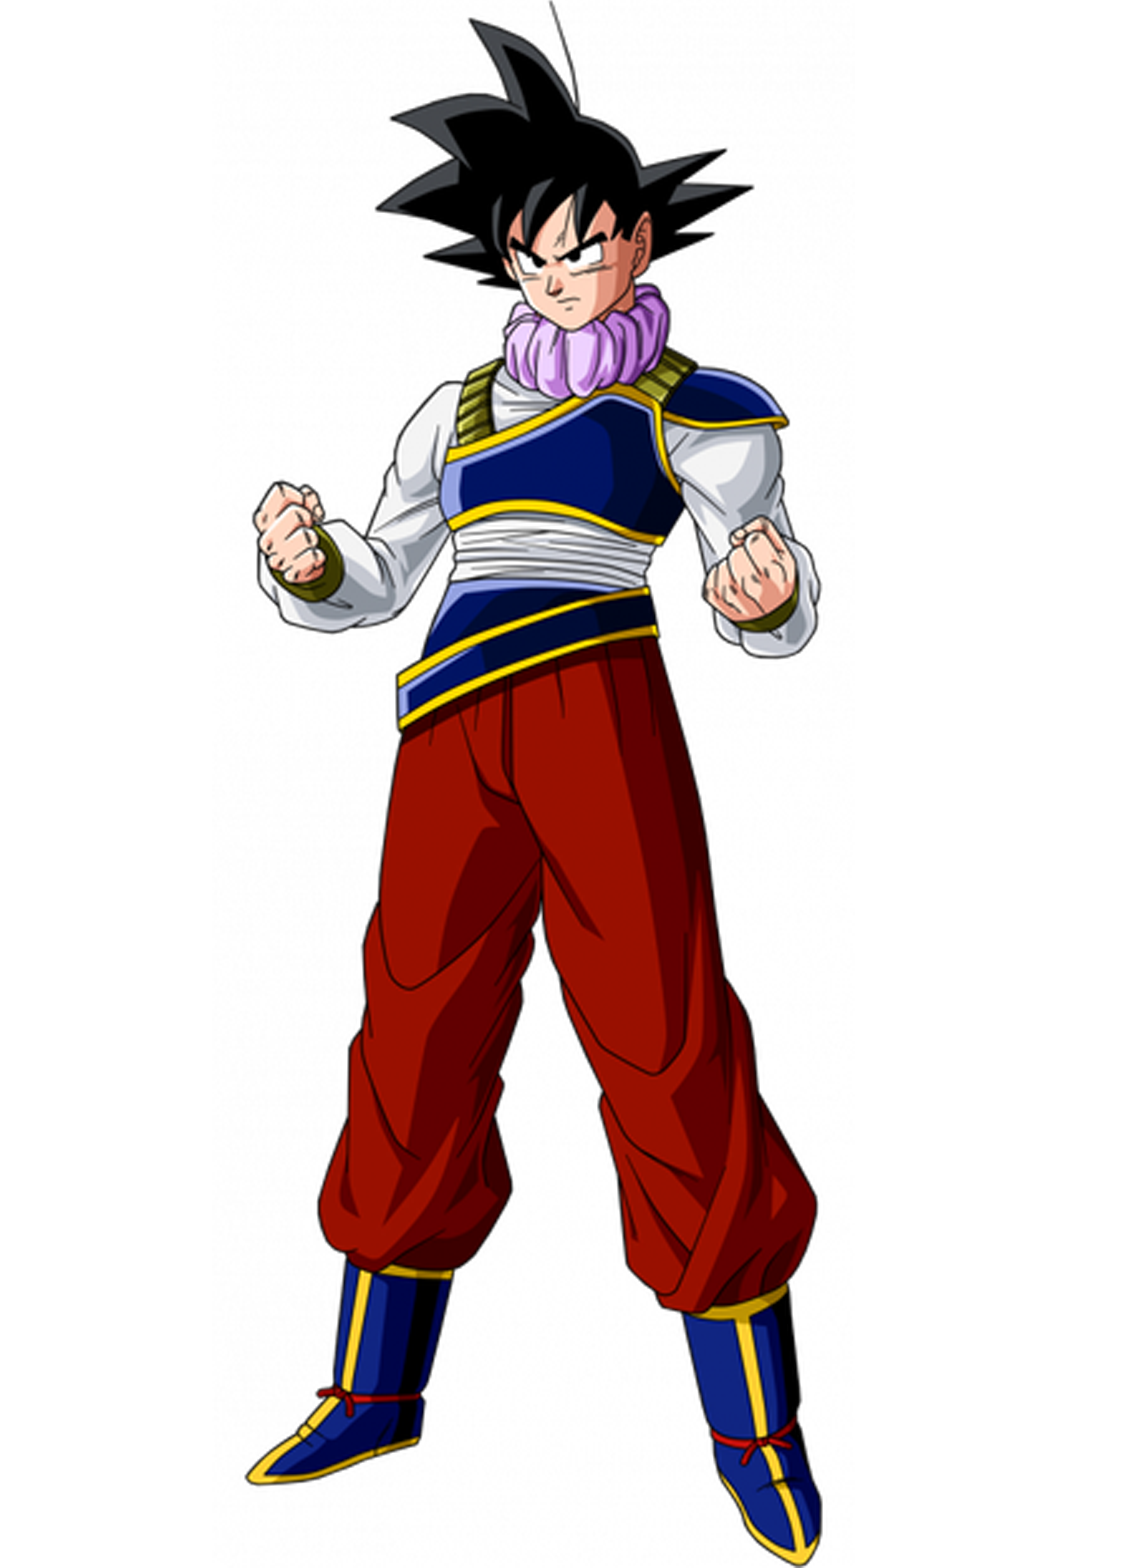 Goku Yardrat Clothes Anime Dragon Ball Super Anime Dragon Ball Dragon Ball Super